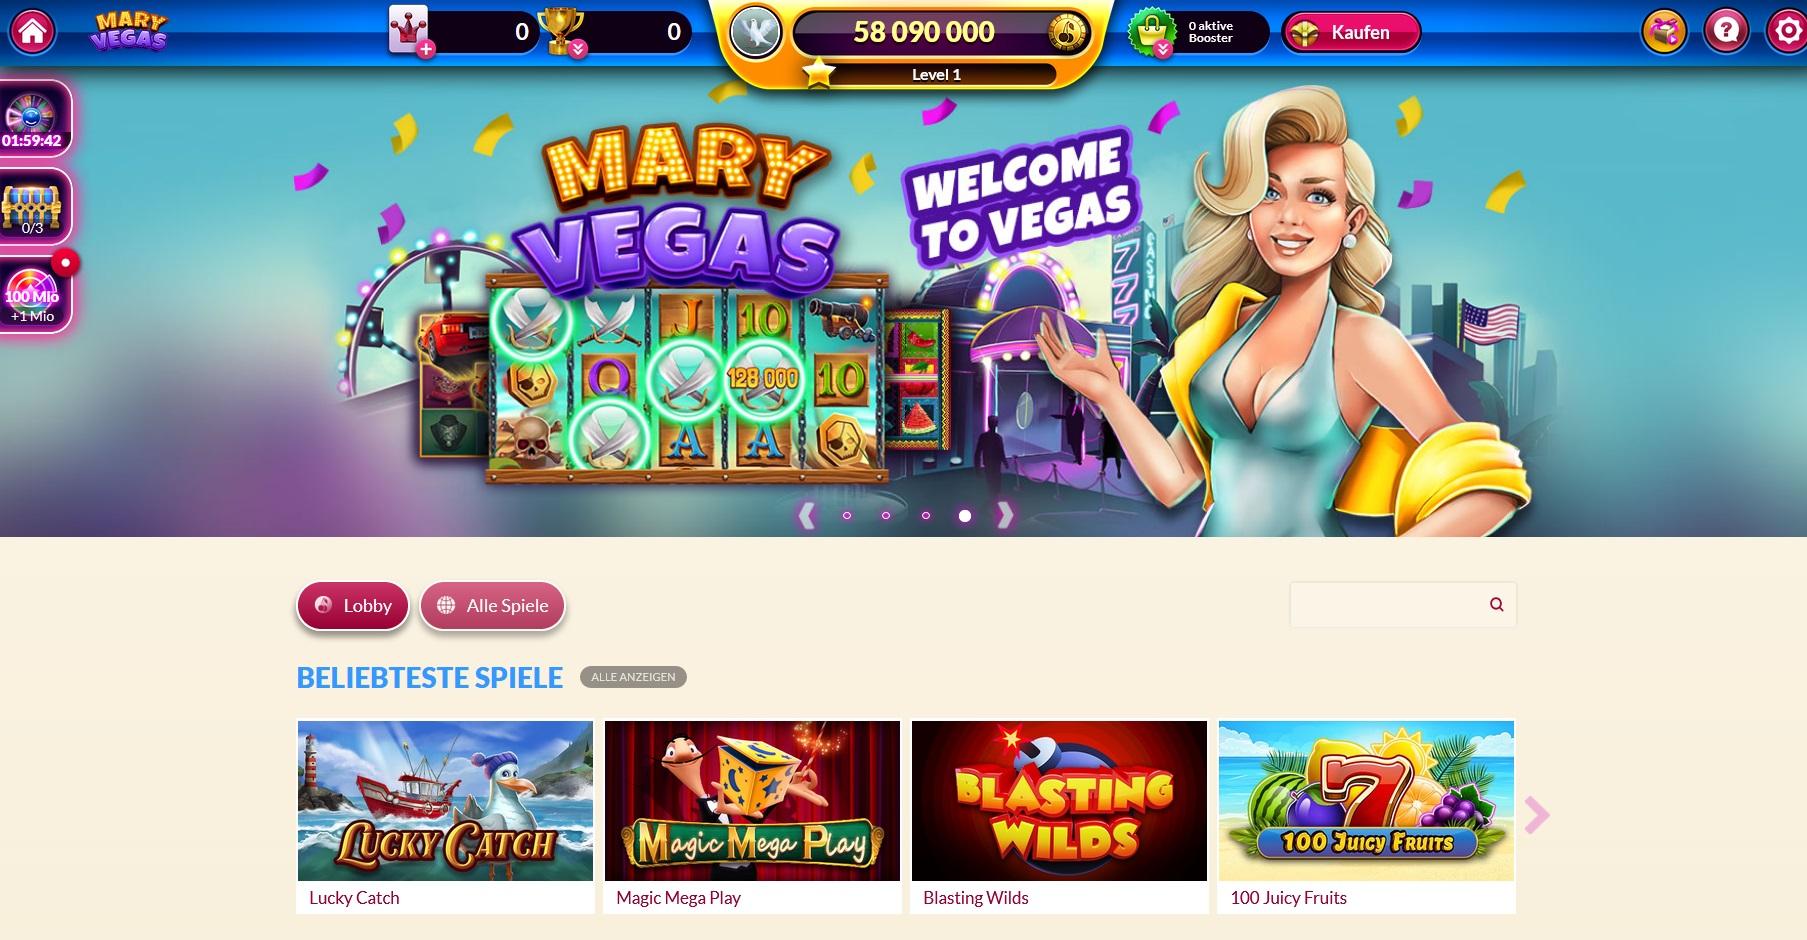 Mary Vegas - Willkommen zu Las Vegas!